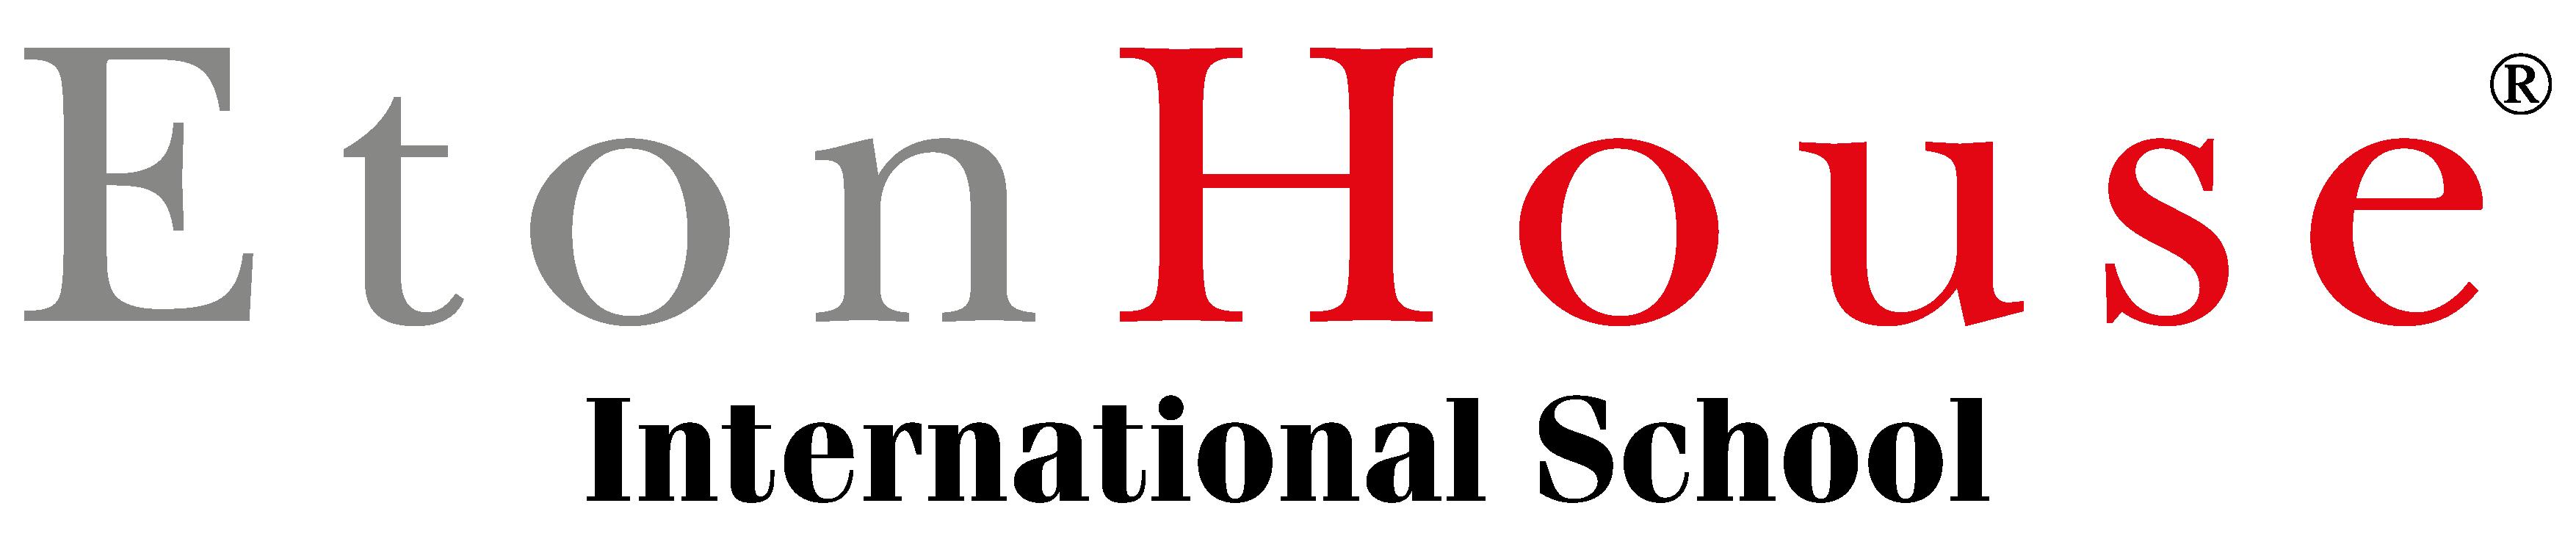 EH Interantional School logo.png